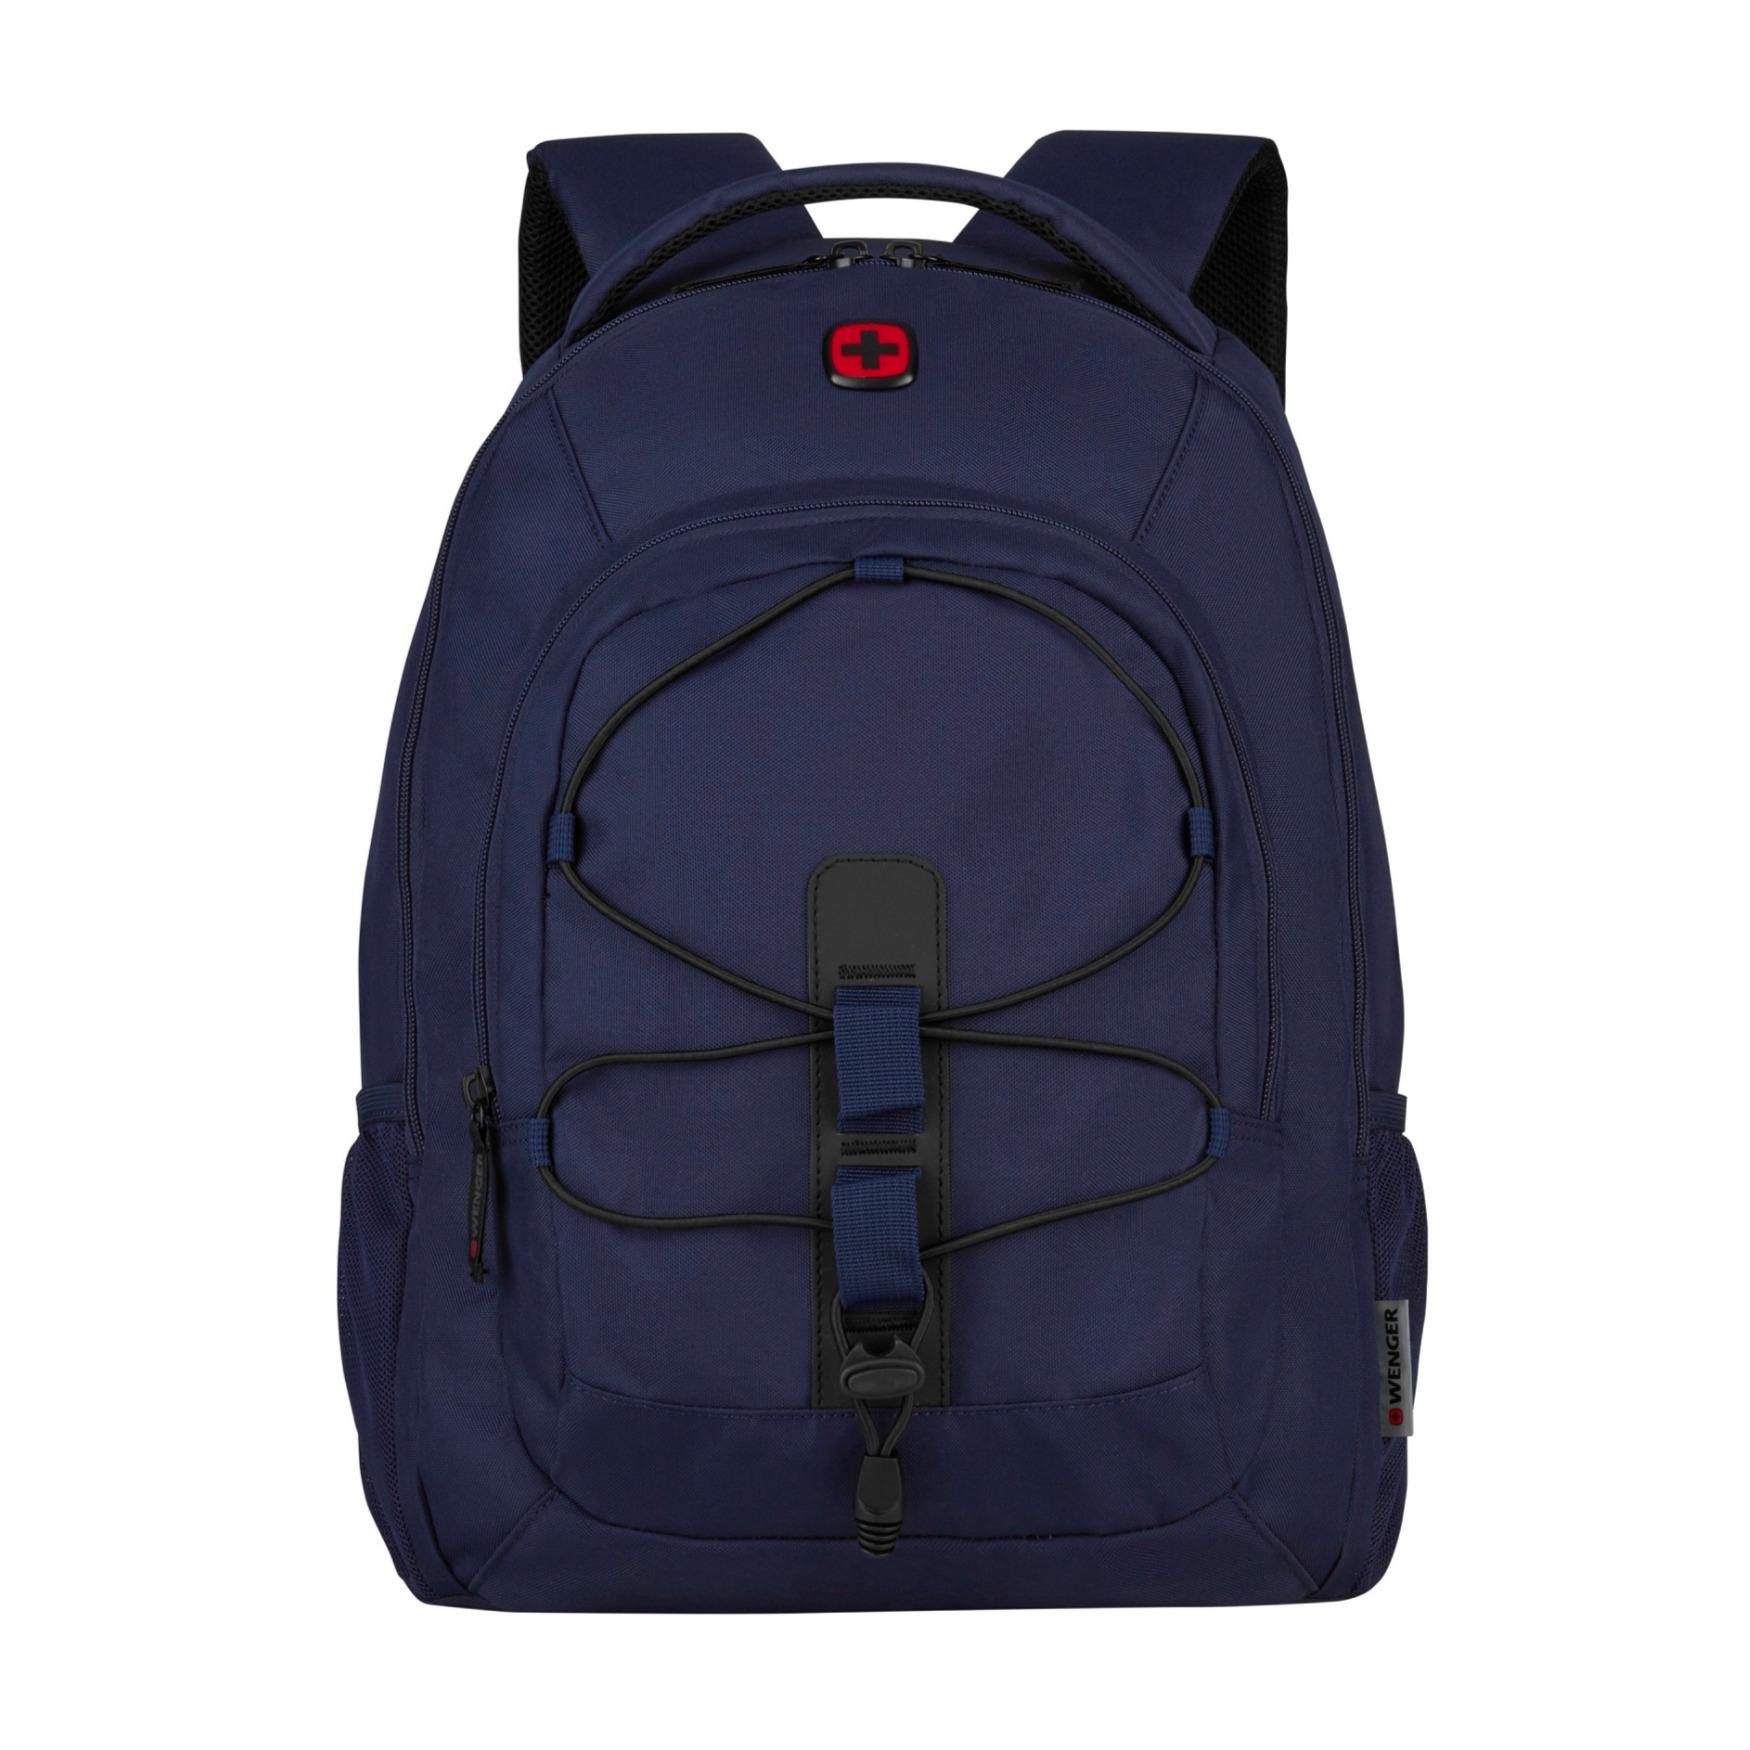 "Swiss Gear Wenger 16"" Laptop Backpacks: Starting From $32.99 + FS"